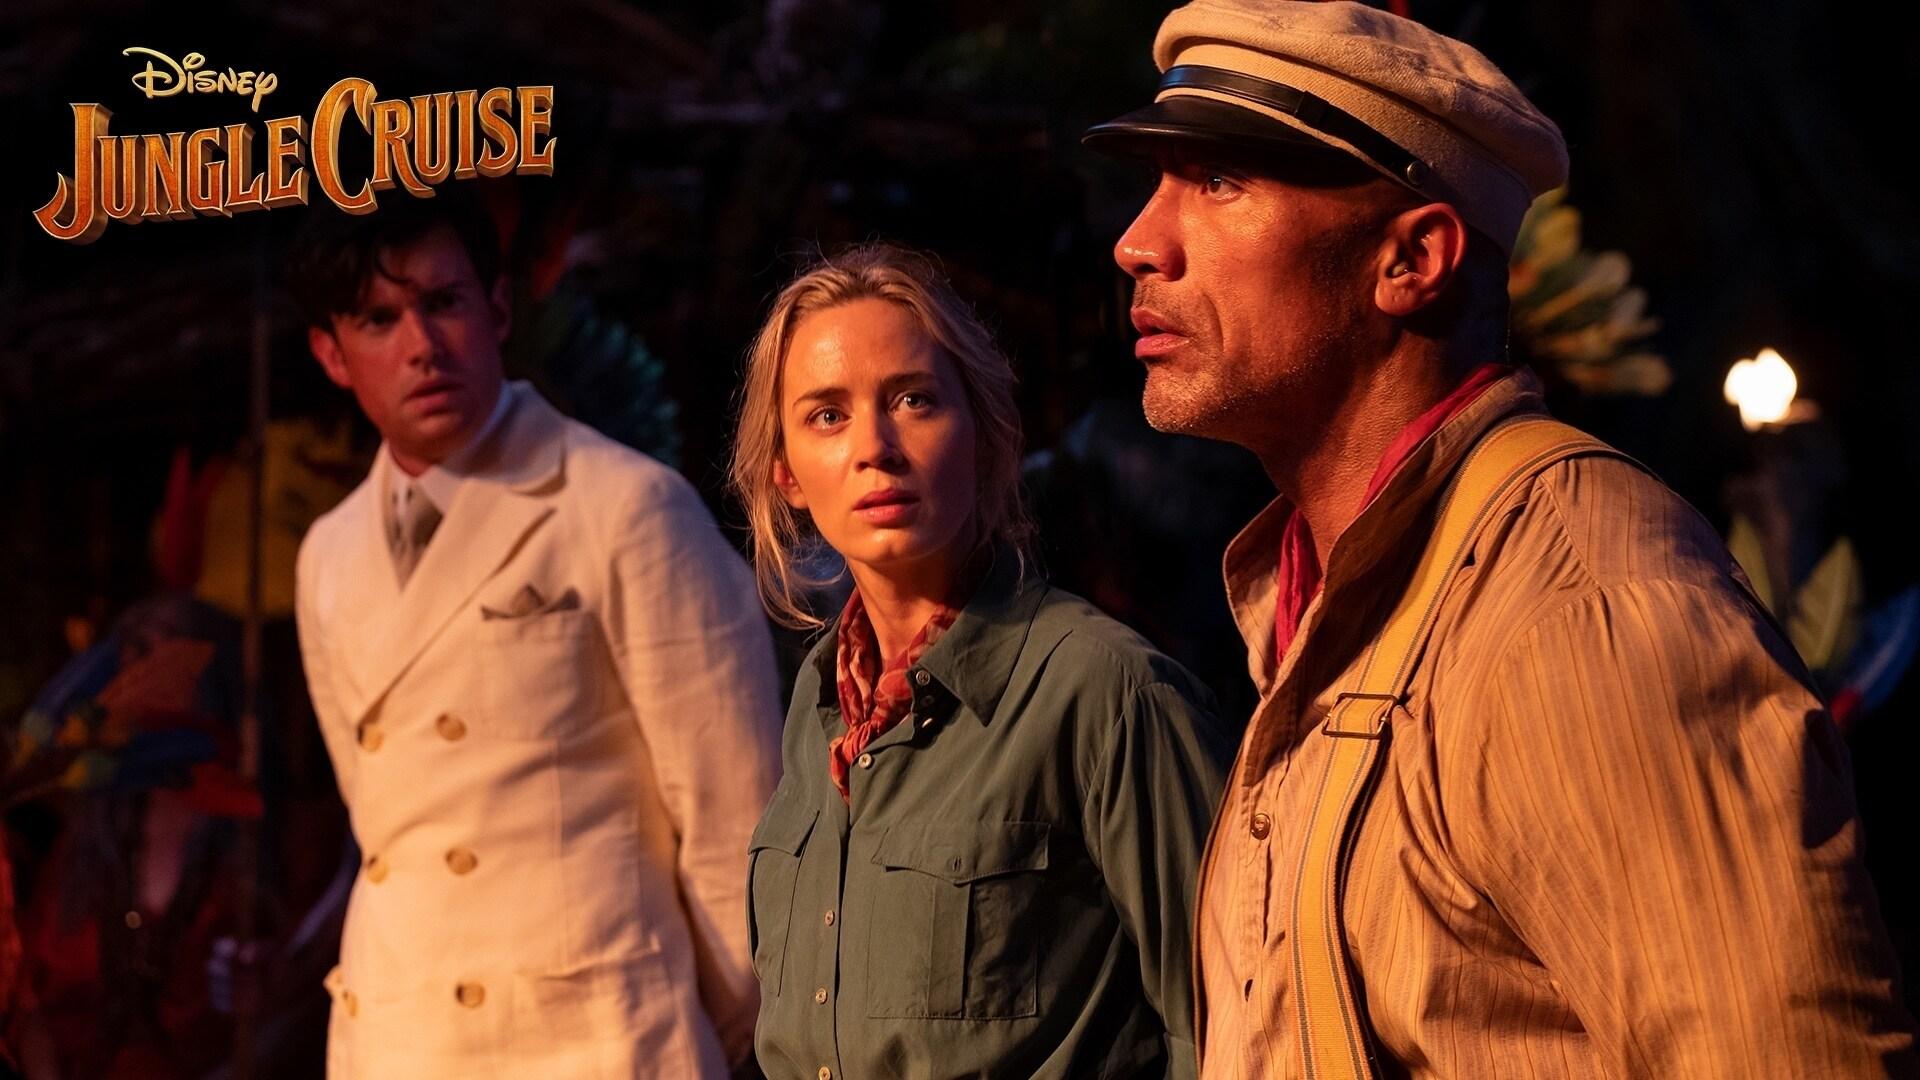 Imagine | Disney's Jungle Cruise | Experience It July 30